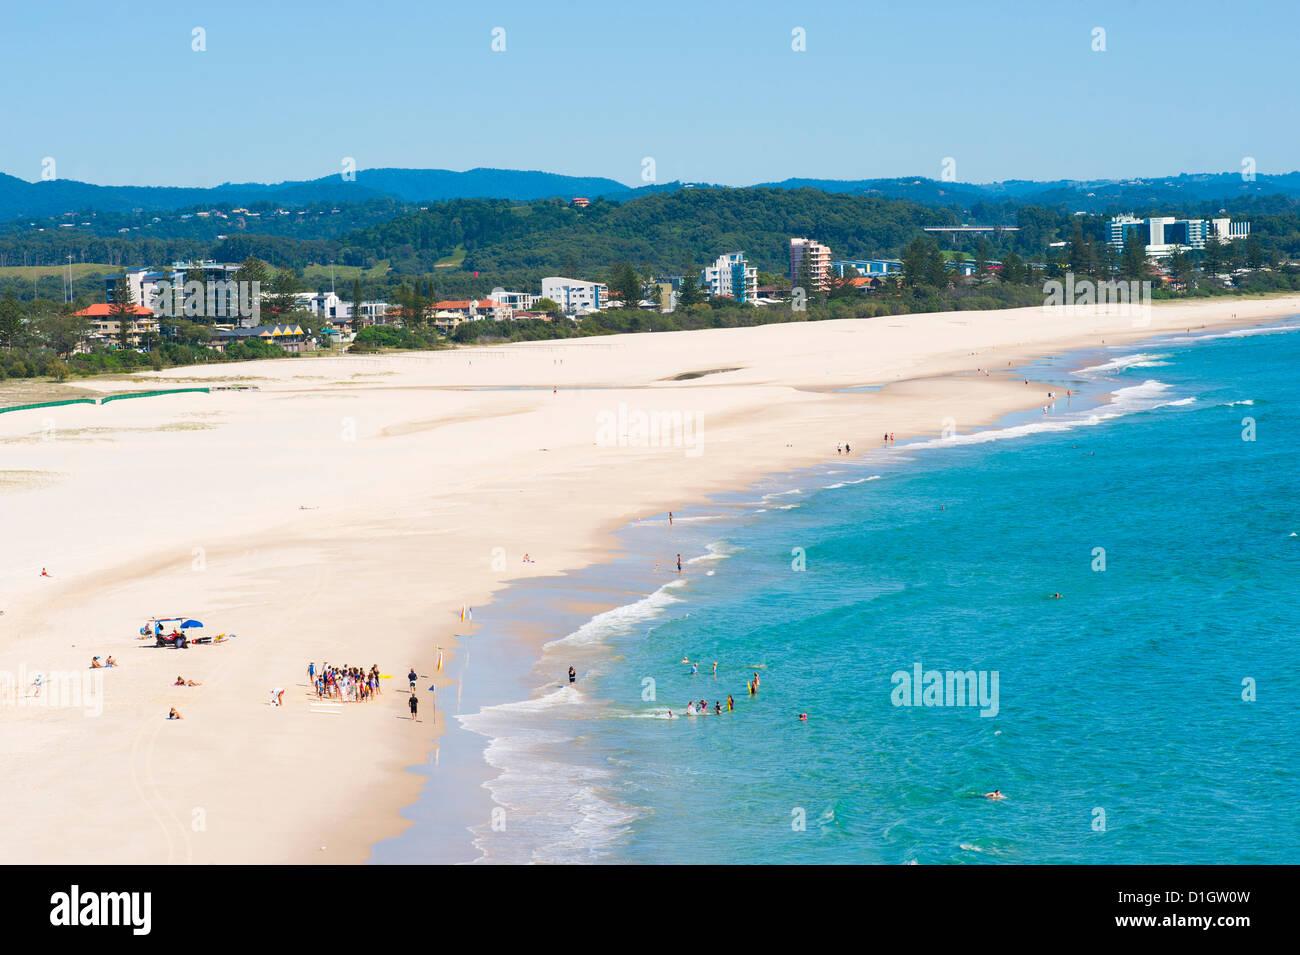 Surfschule in Coolangatta Beach, Gold Coast, Queensland, Australien, Pazifik Stockbild